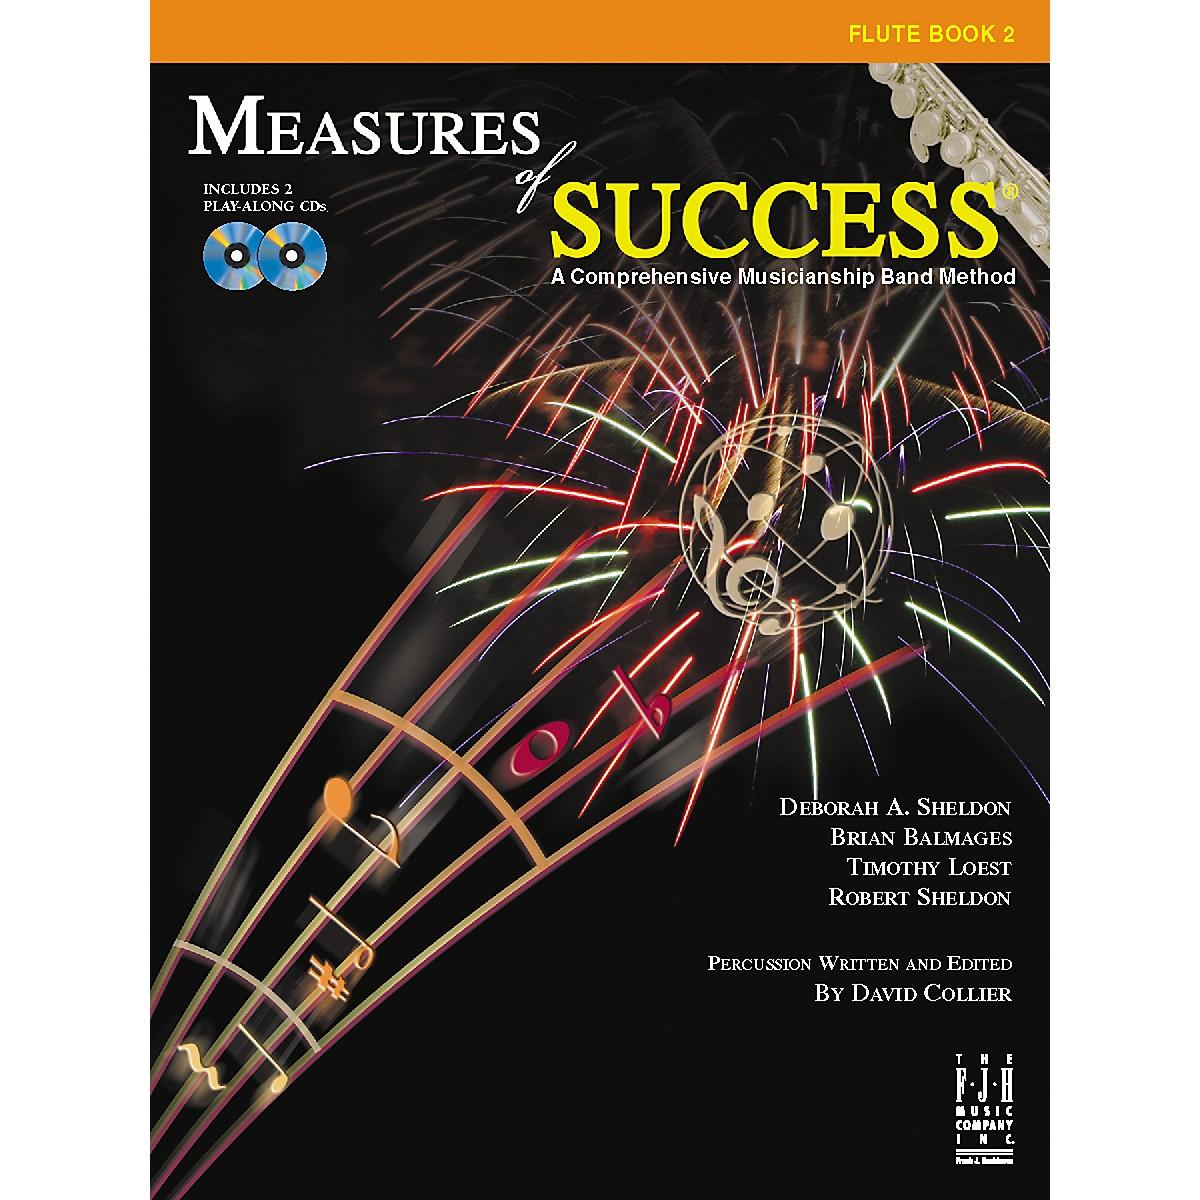 FJH Music Measures of Success Flute Book 2